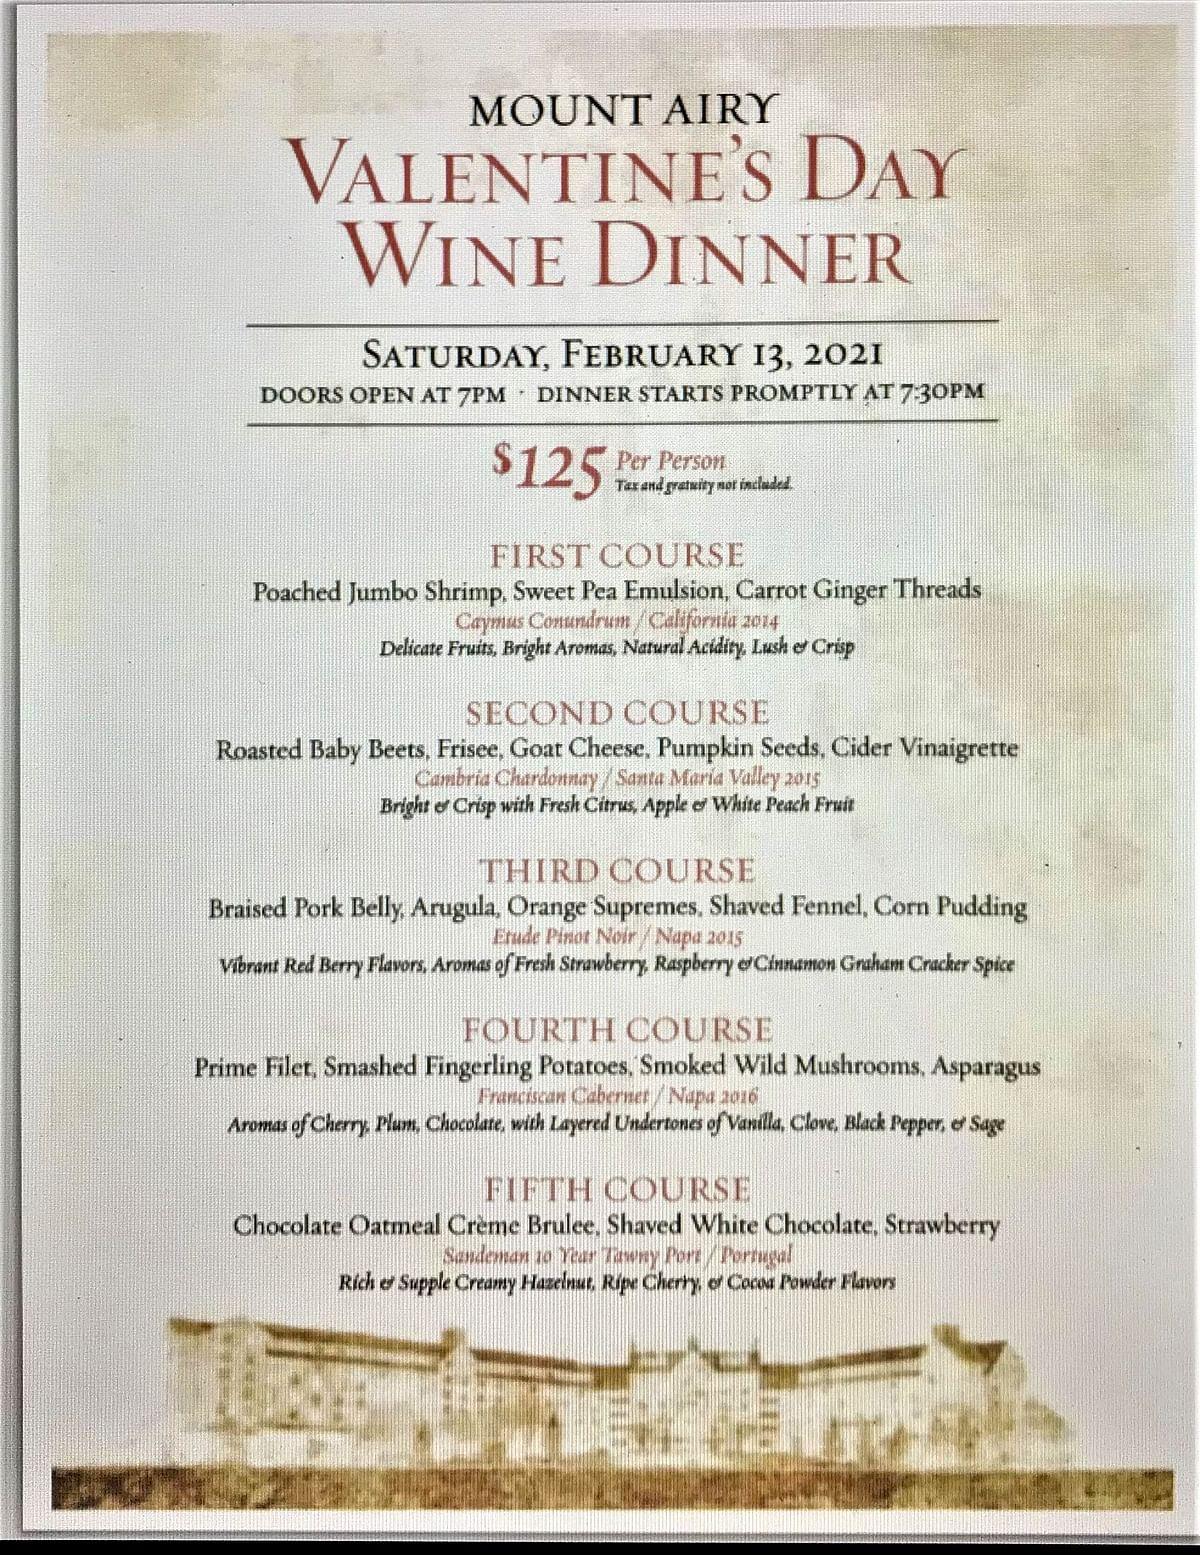 The Mount Airy Casino Resort 2021 Valentine's Day Wine Dinner Menu